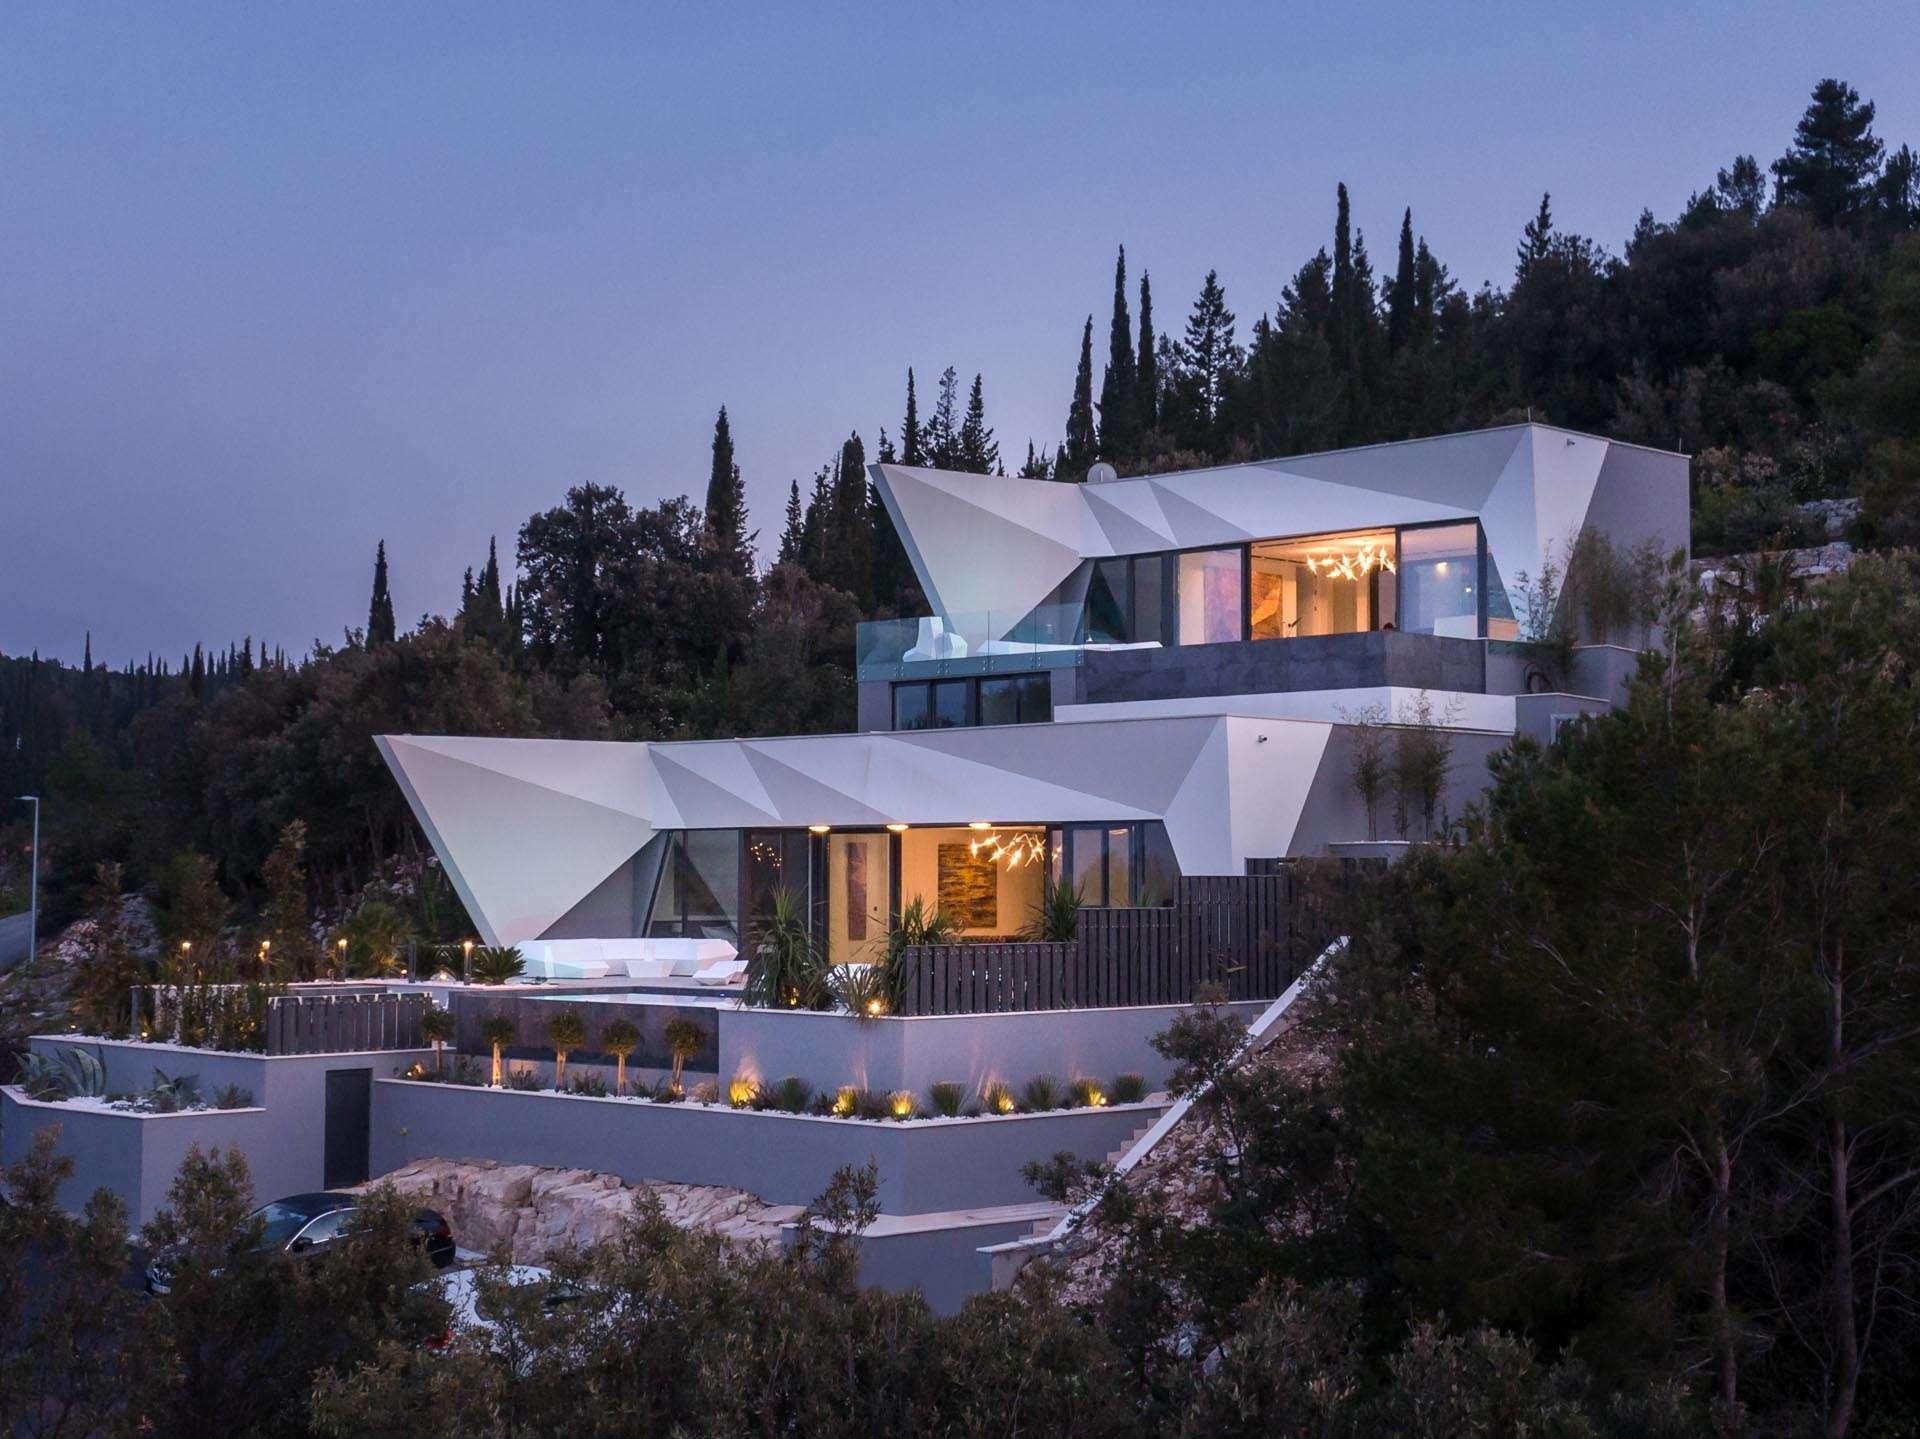 Luxury vacation rentals europe - Croatia - Korcula island - Zrnovo - La Scala - Image 1/21